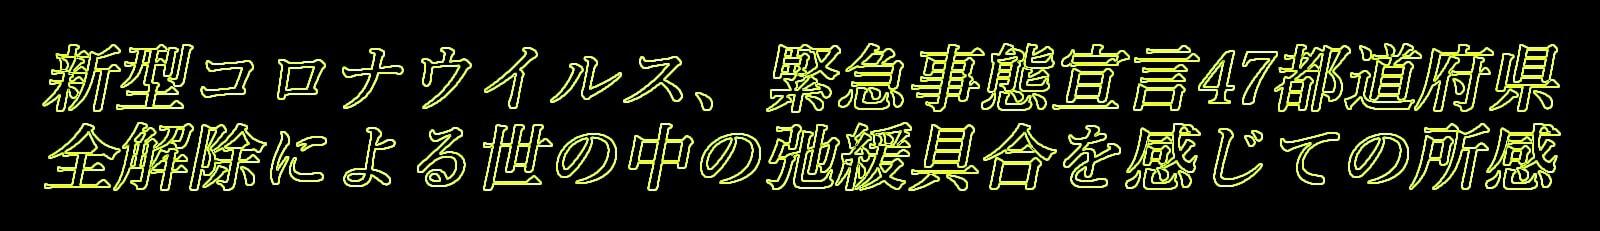 f:id:oomoroitakugoro:20200527152552abdj:plain